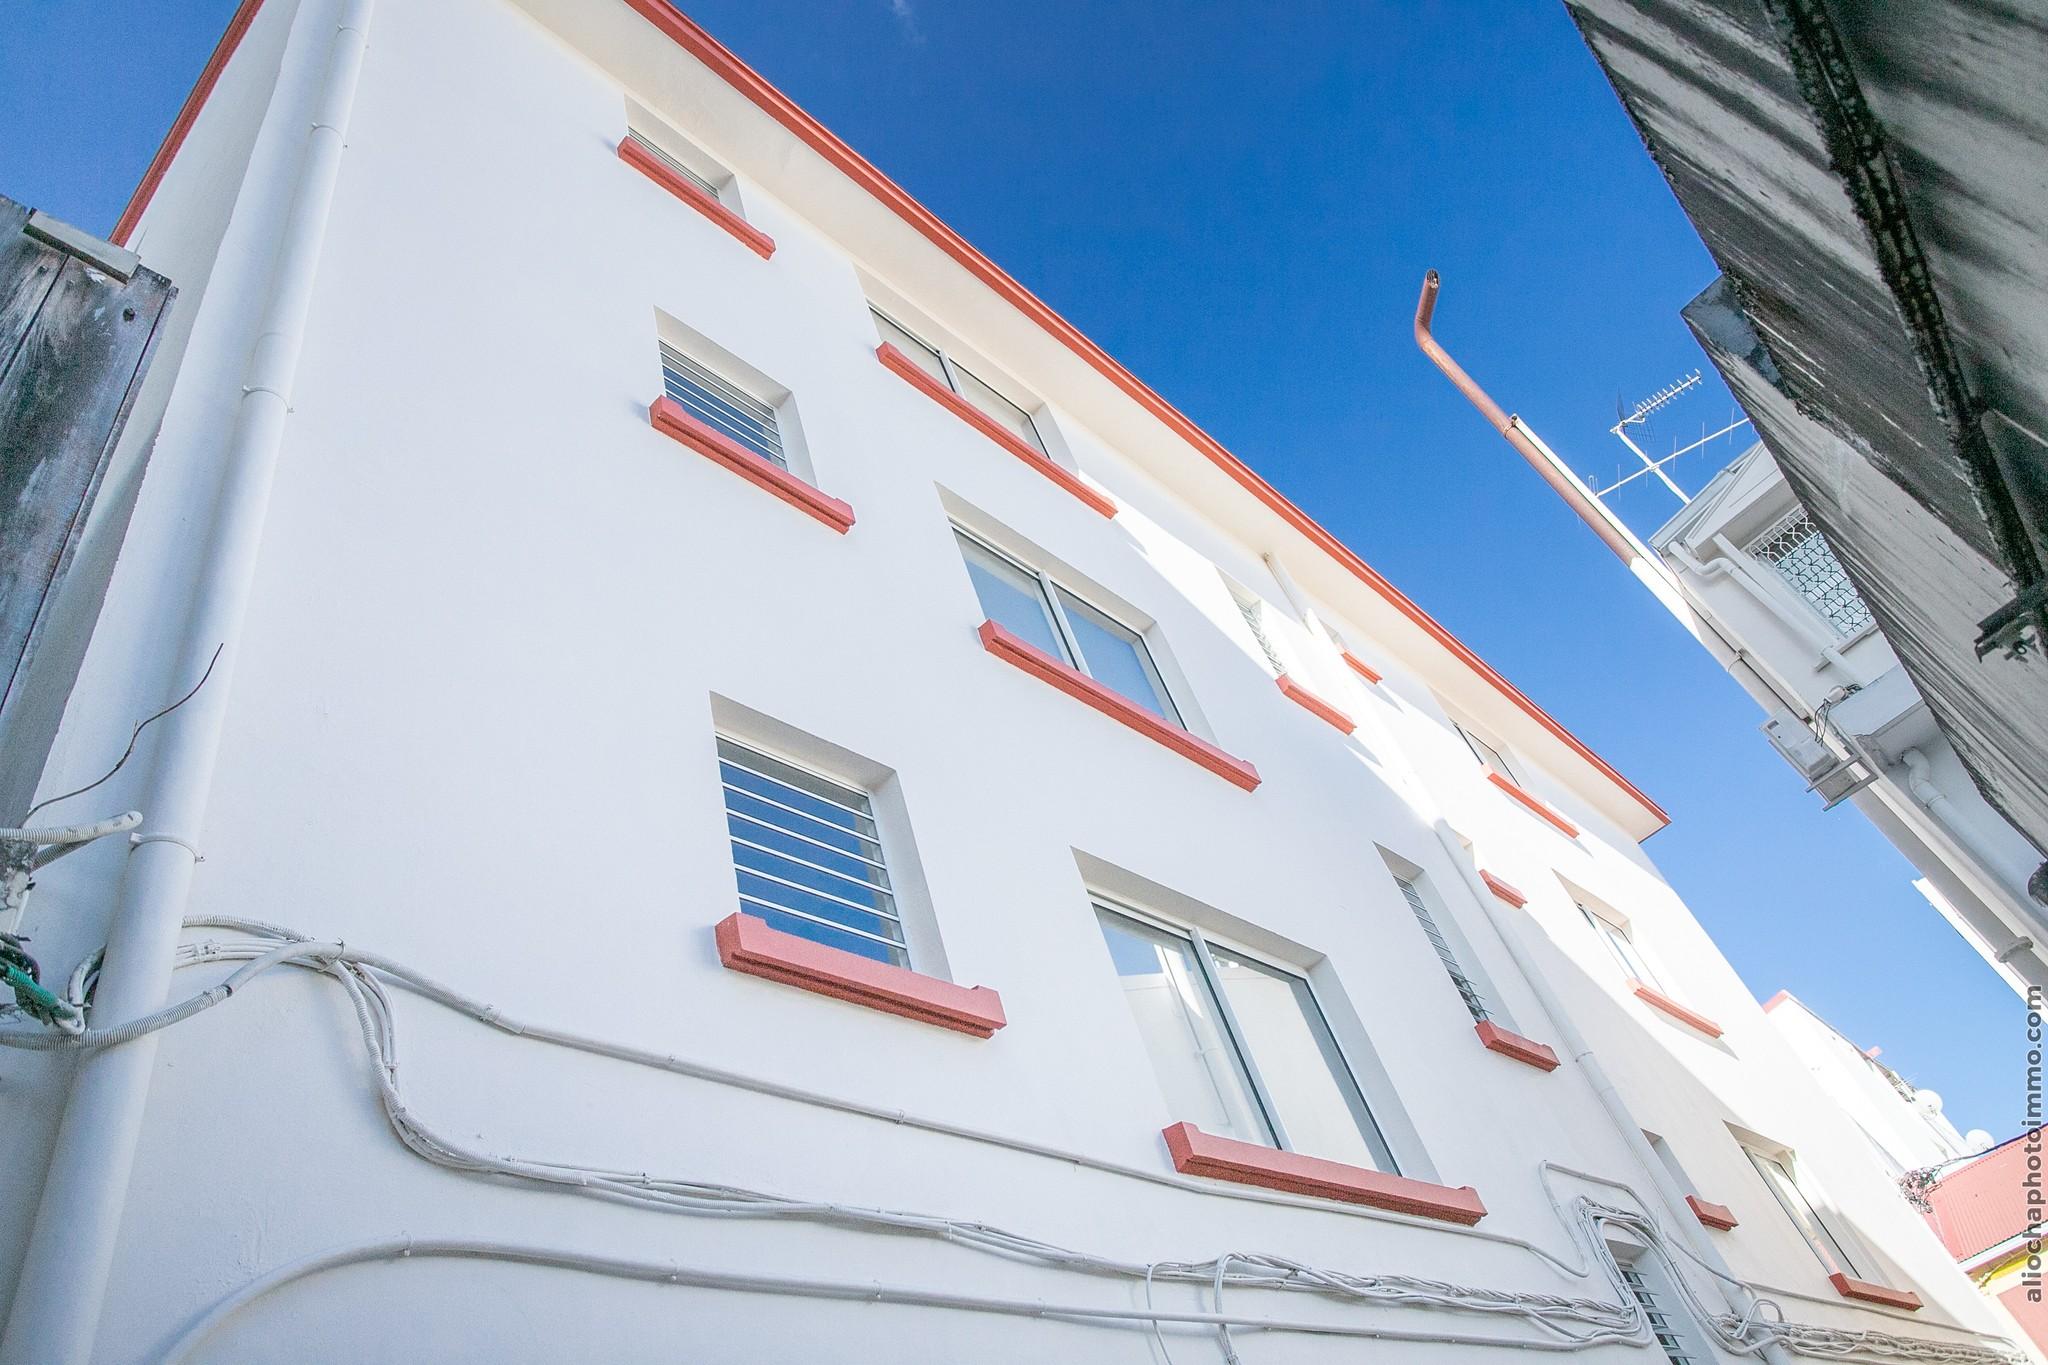 arcavs residence fdf num. 01 - 105-web